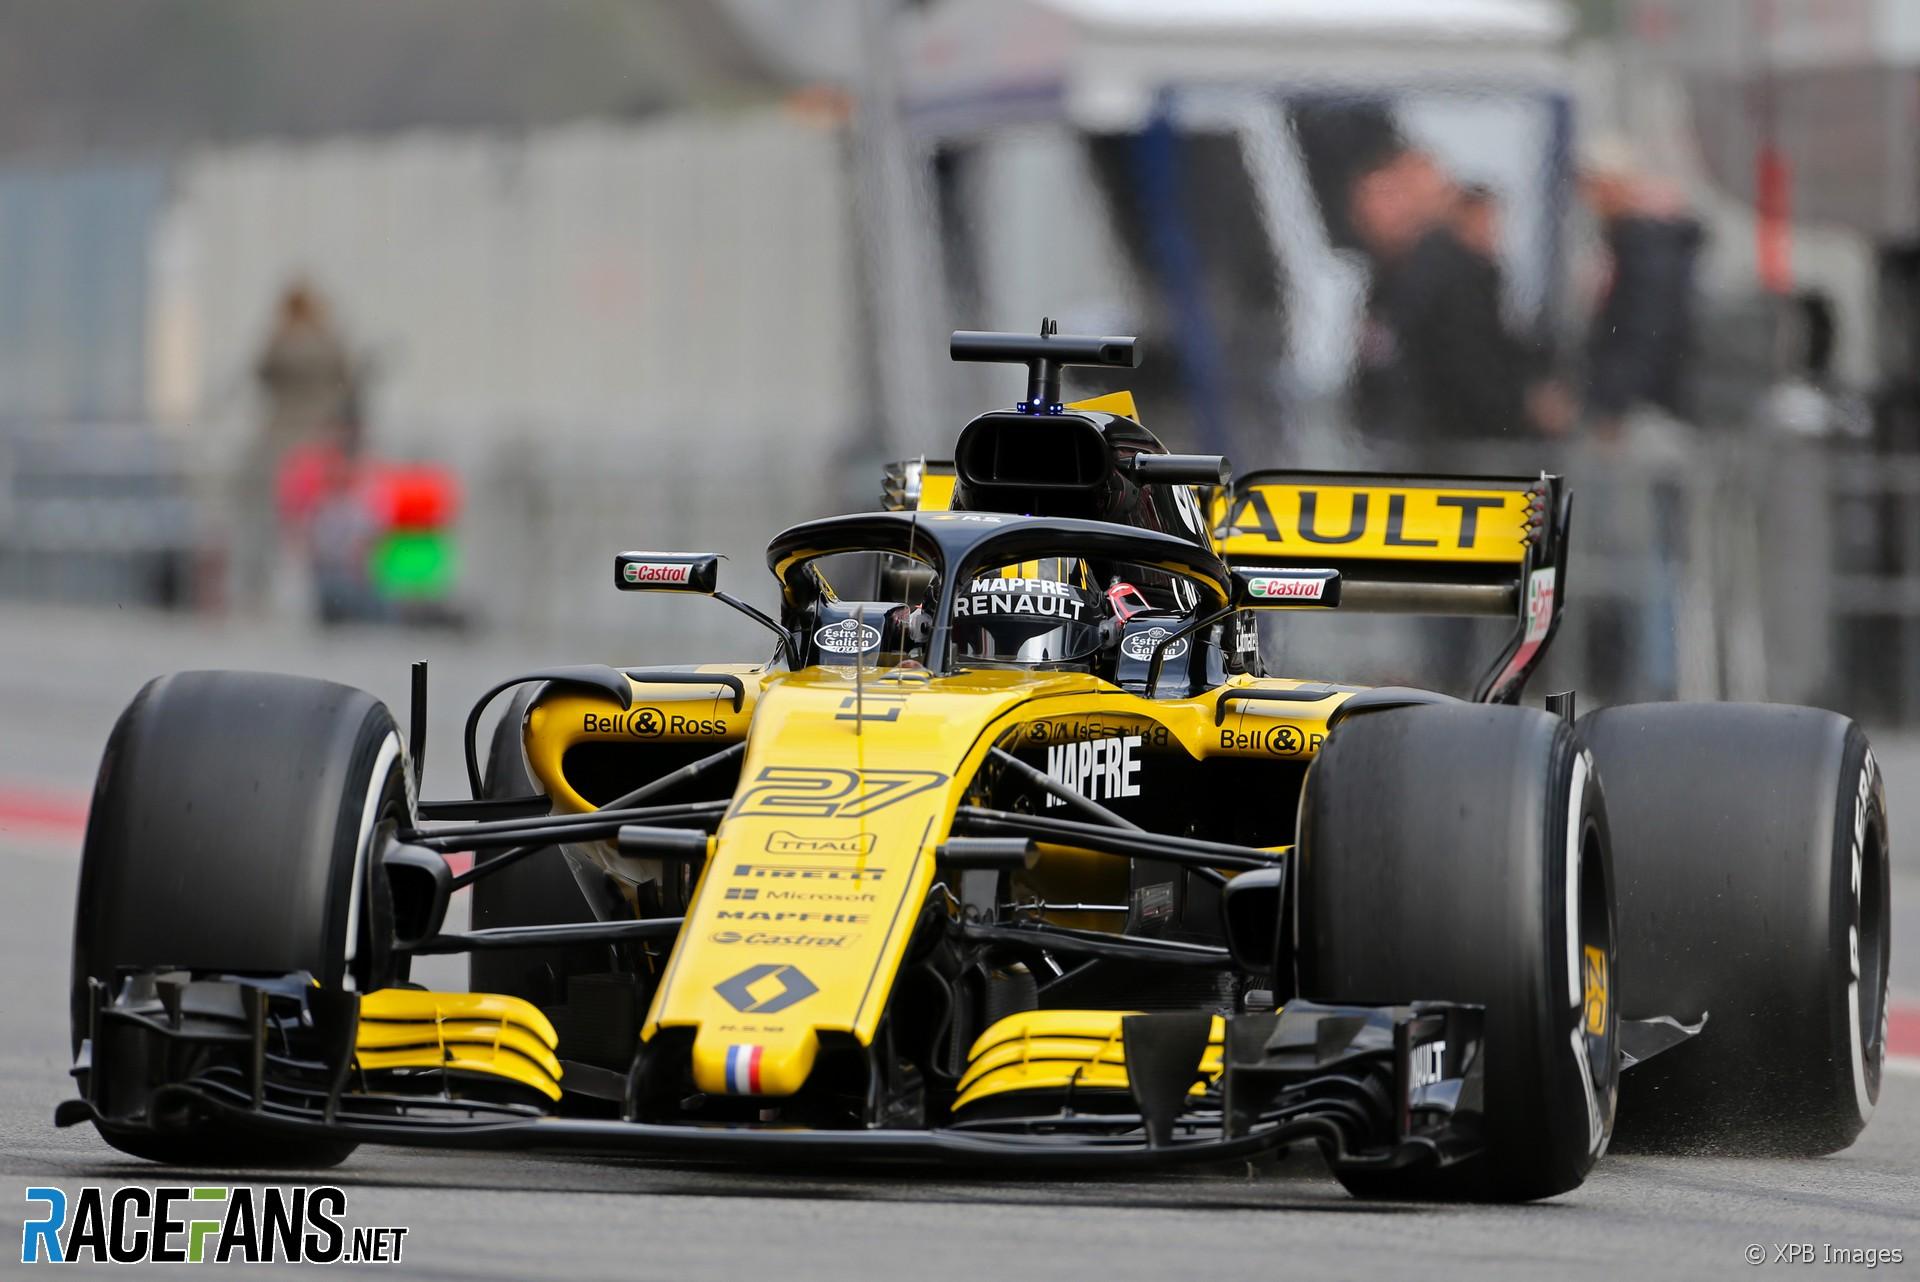 Nico Hulkenberg, Renault, Circuit de Catalunya test, Monday 26th February, 2018